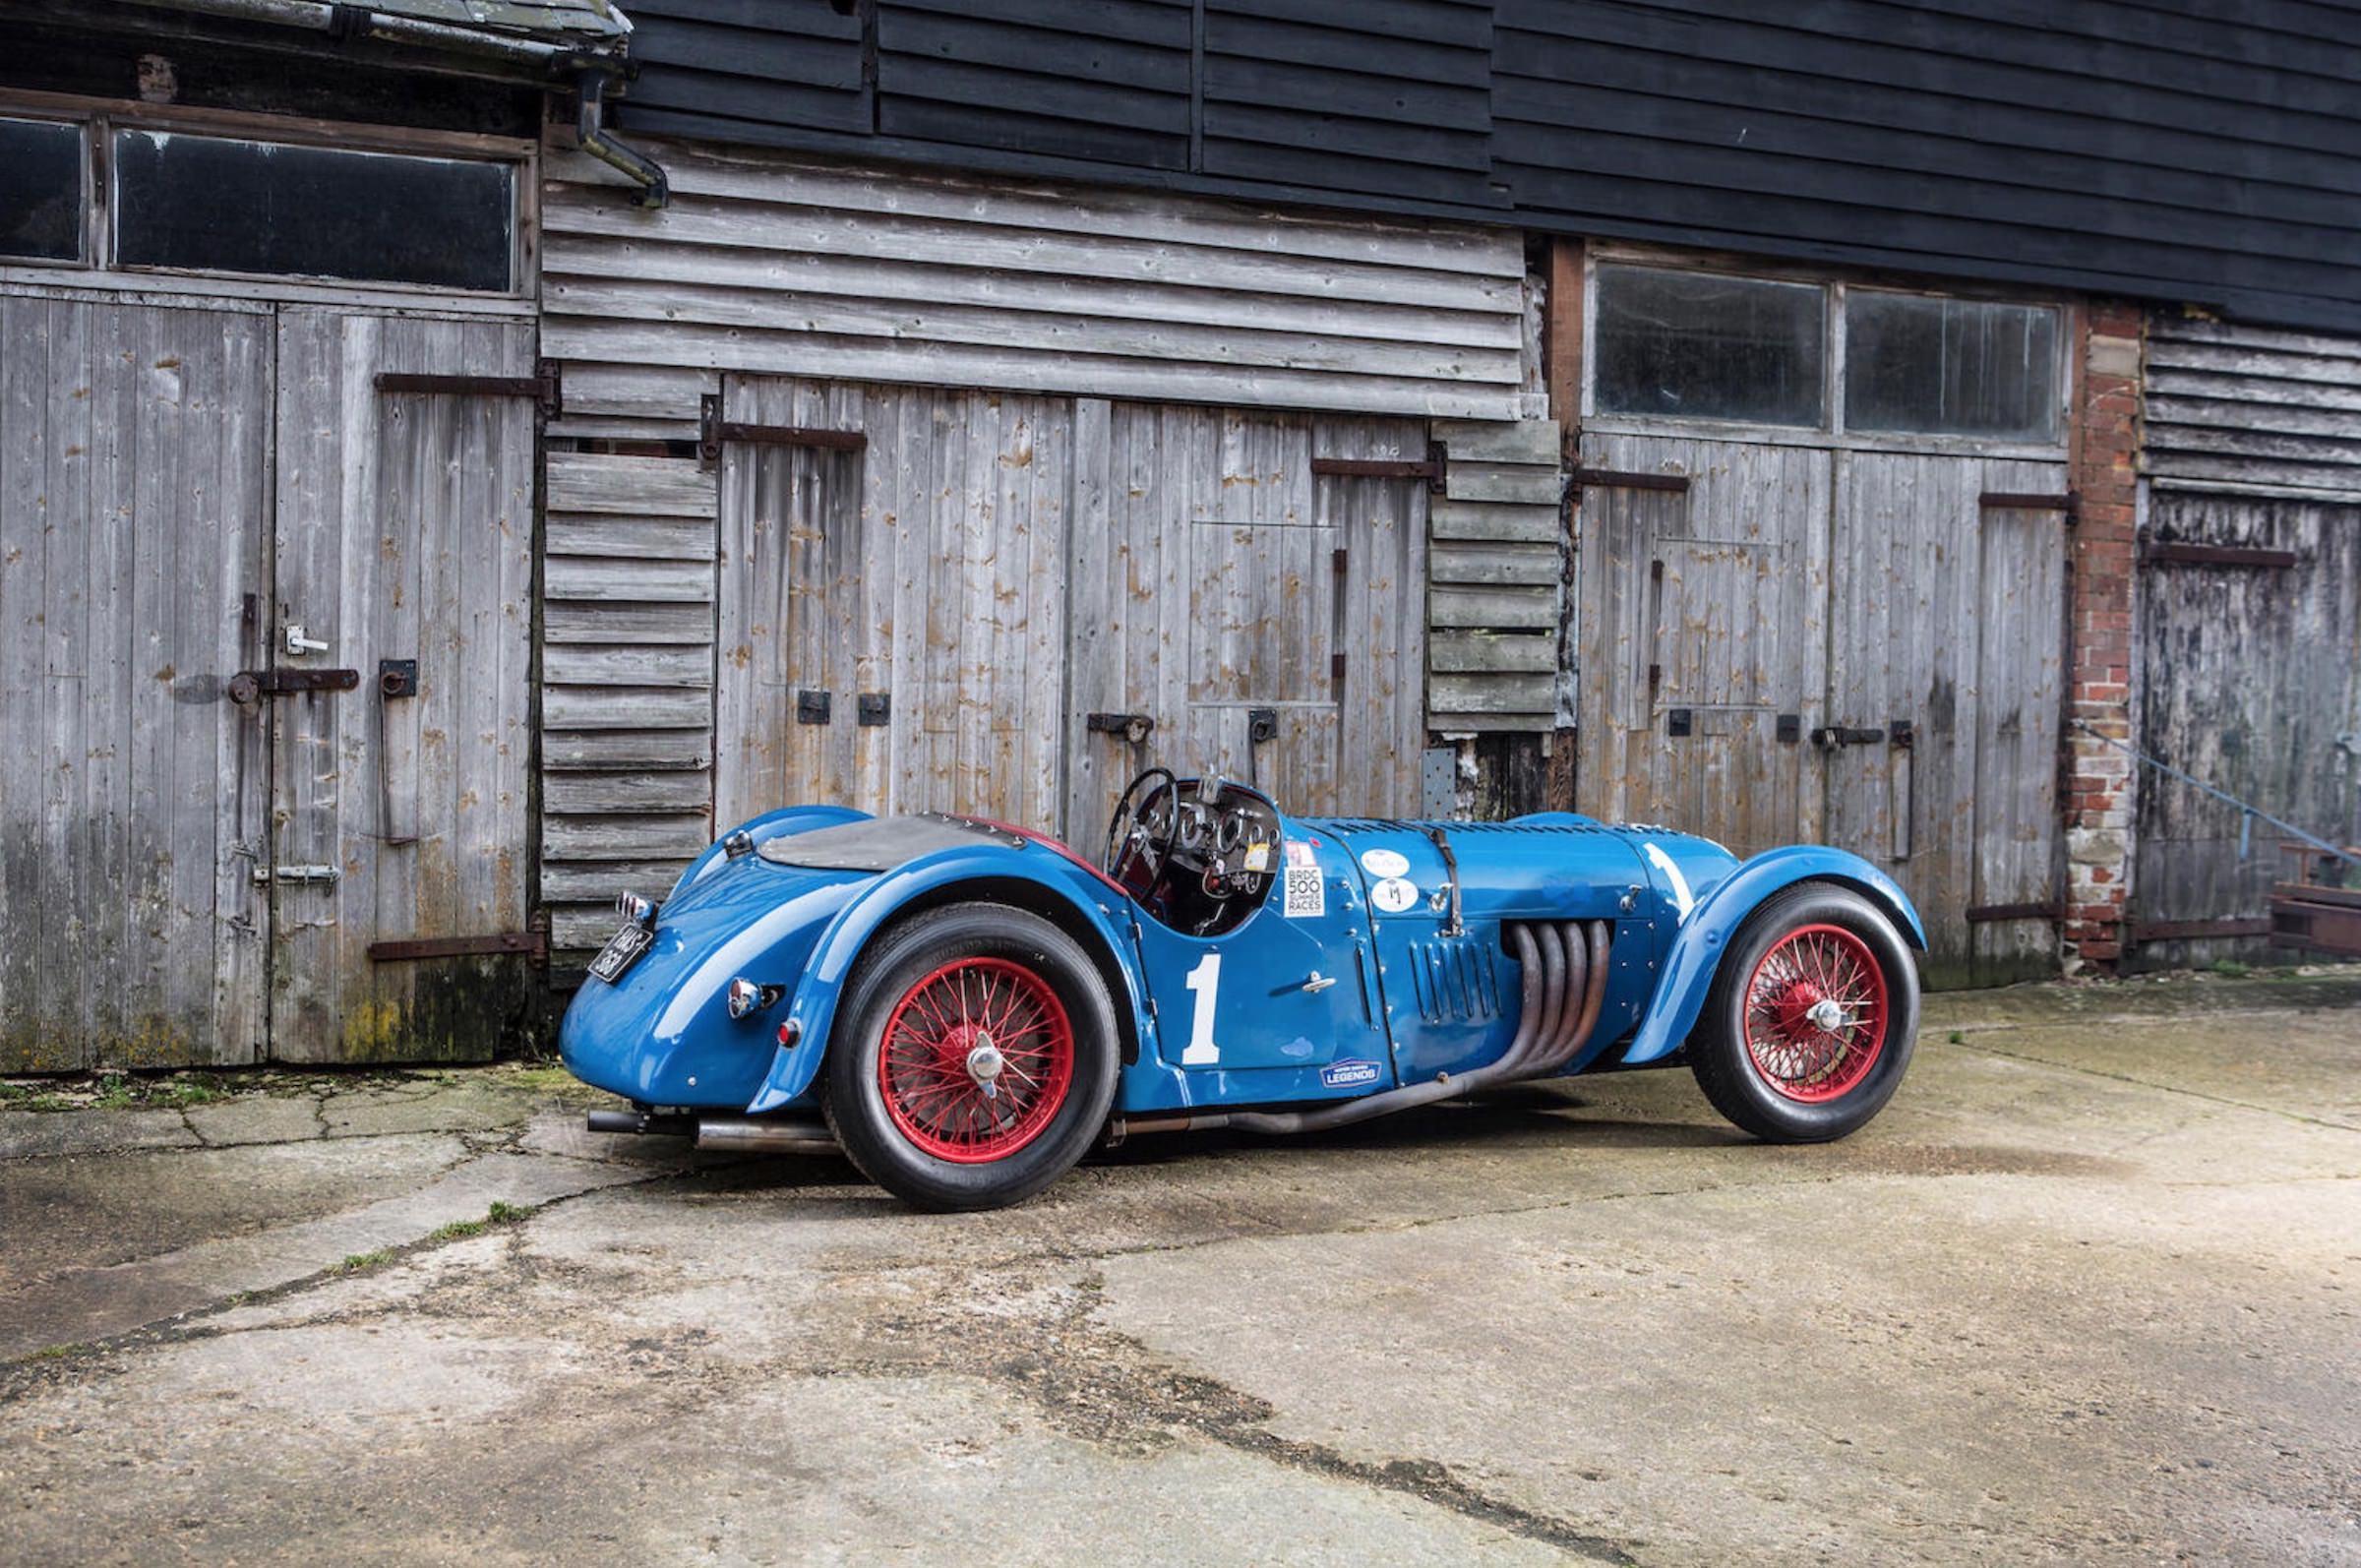 Rare Supercharged British Racer: 1936 2-Litre Alta Sports Car